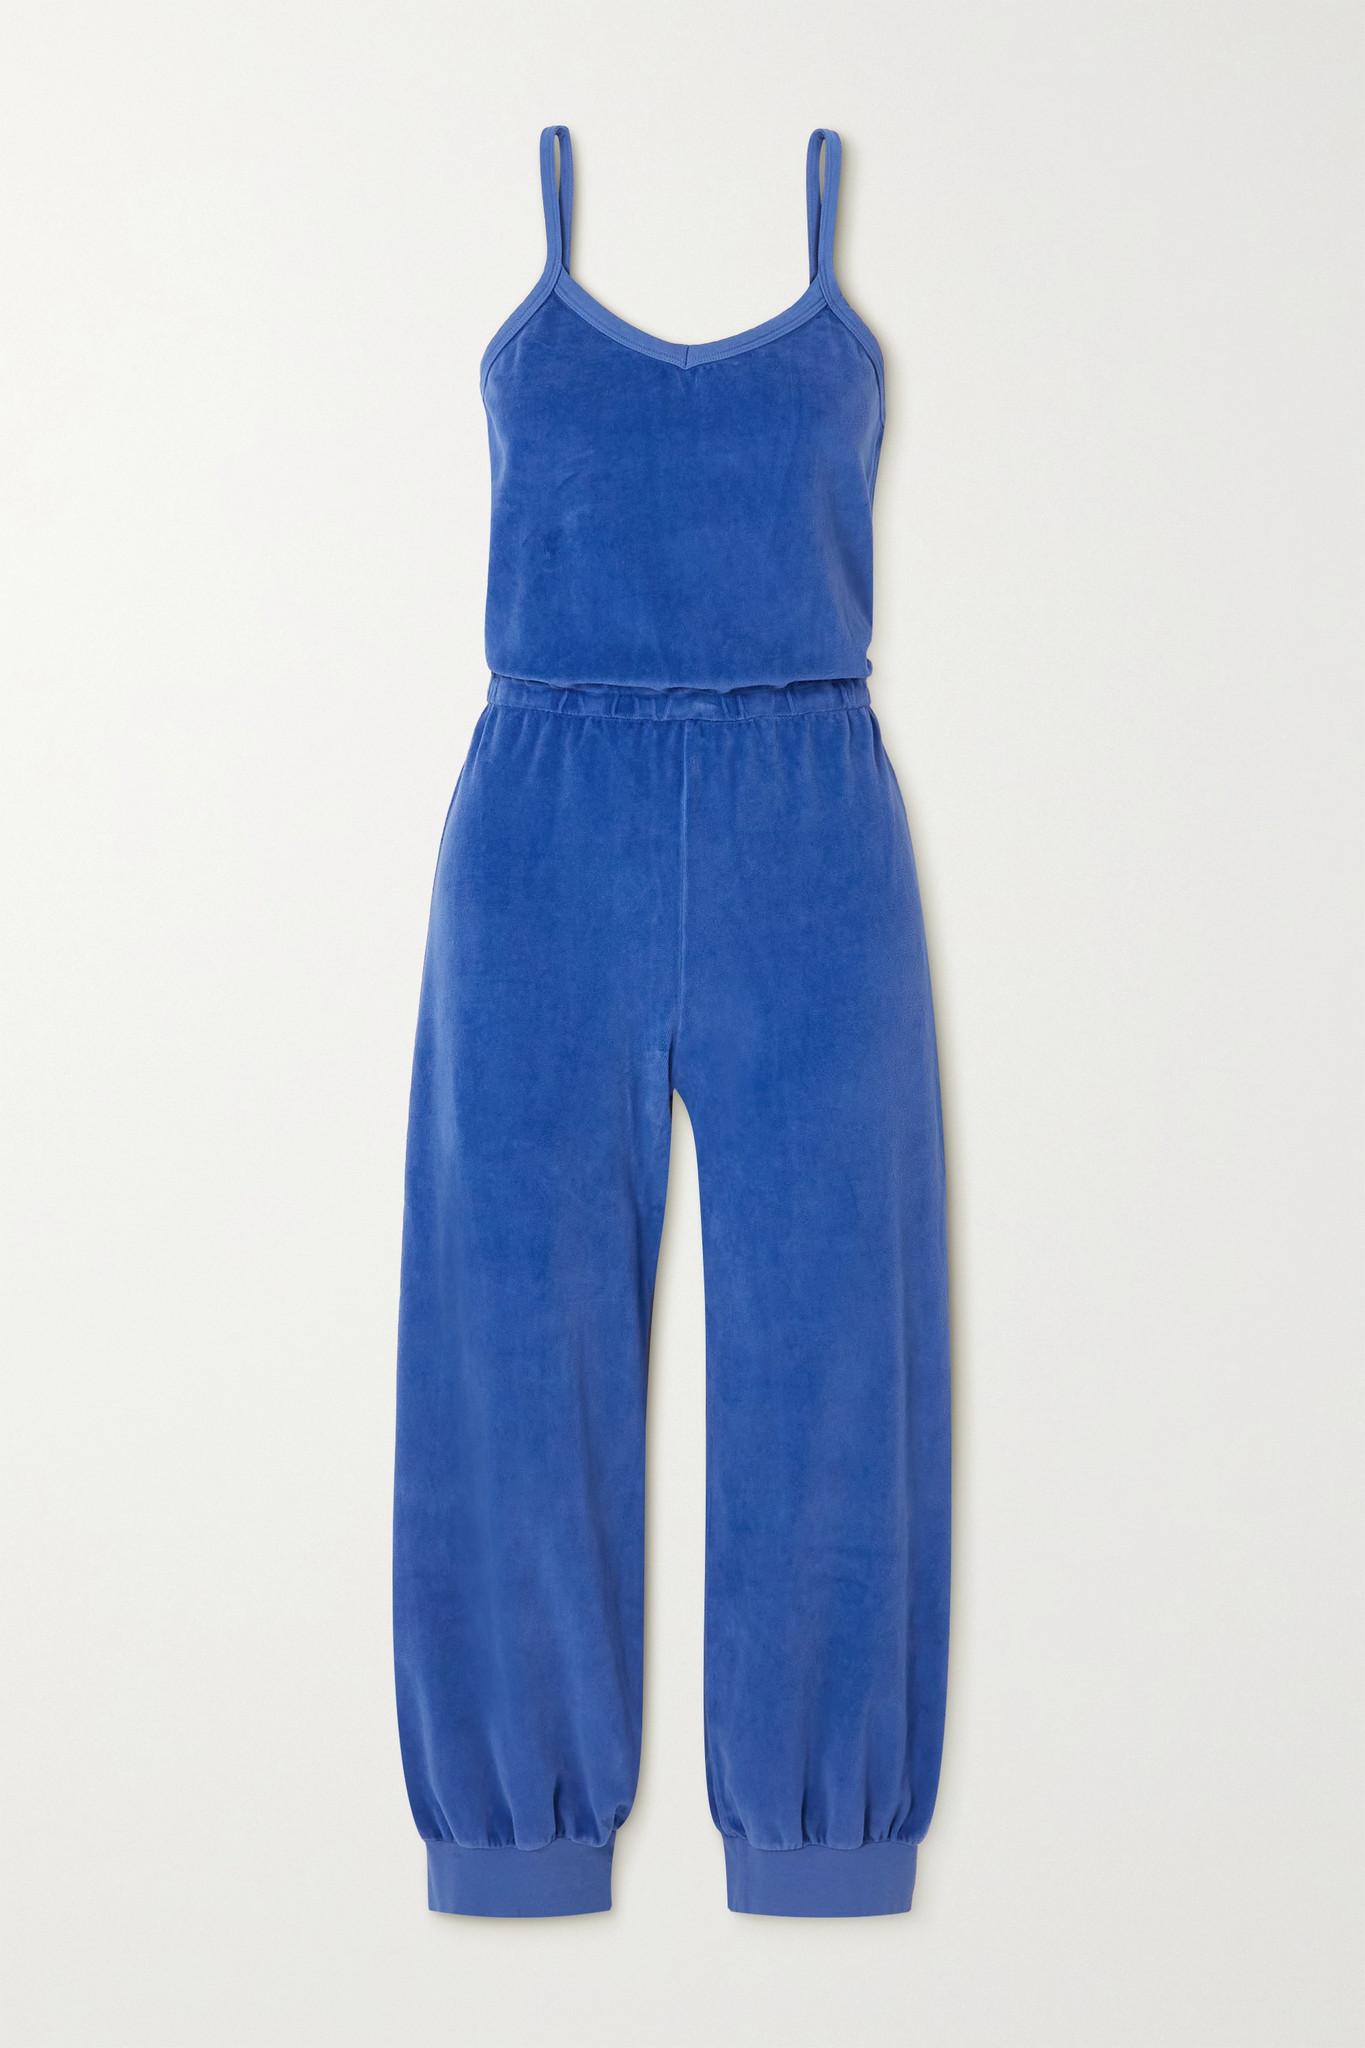 SUZIE KONDI - Tank 棉质混纺密丝绒七分连身裤 - 蓝色 - medium